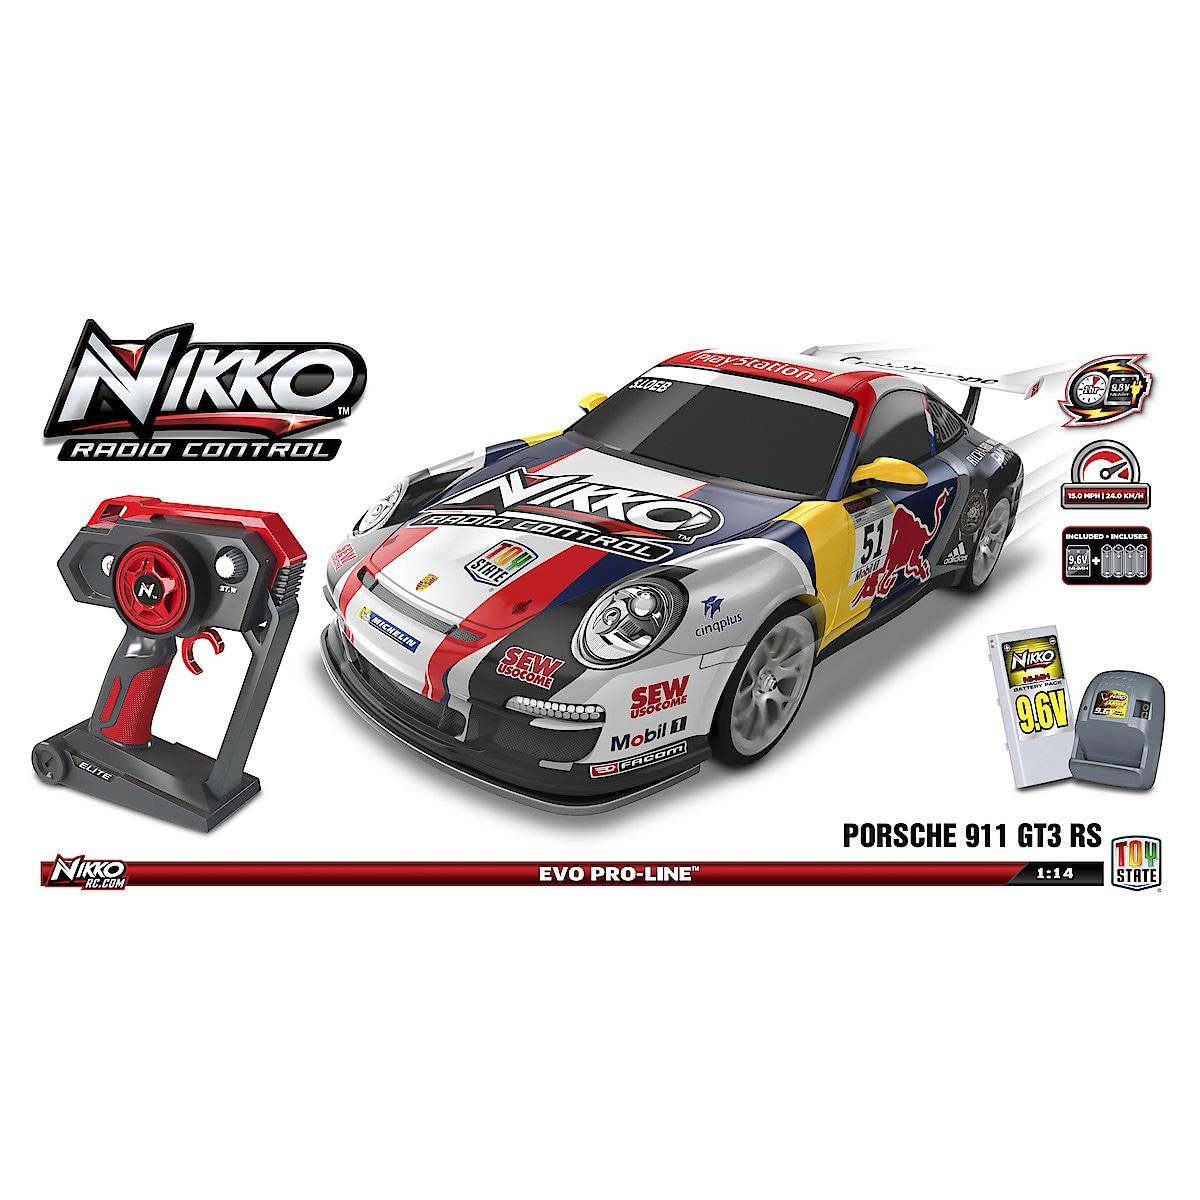 Nikko Street Car Porsche 911 radiostyrt bil